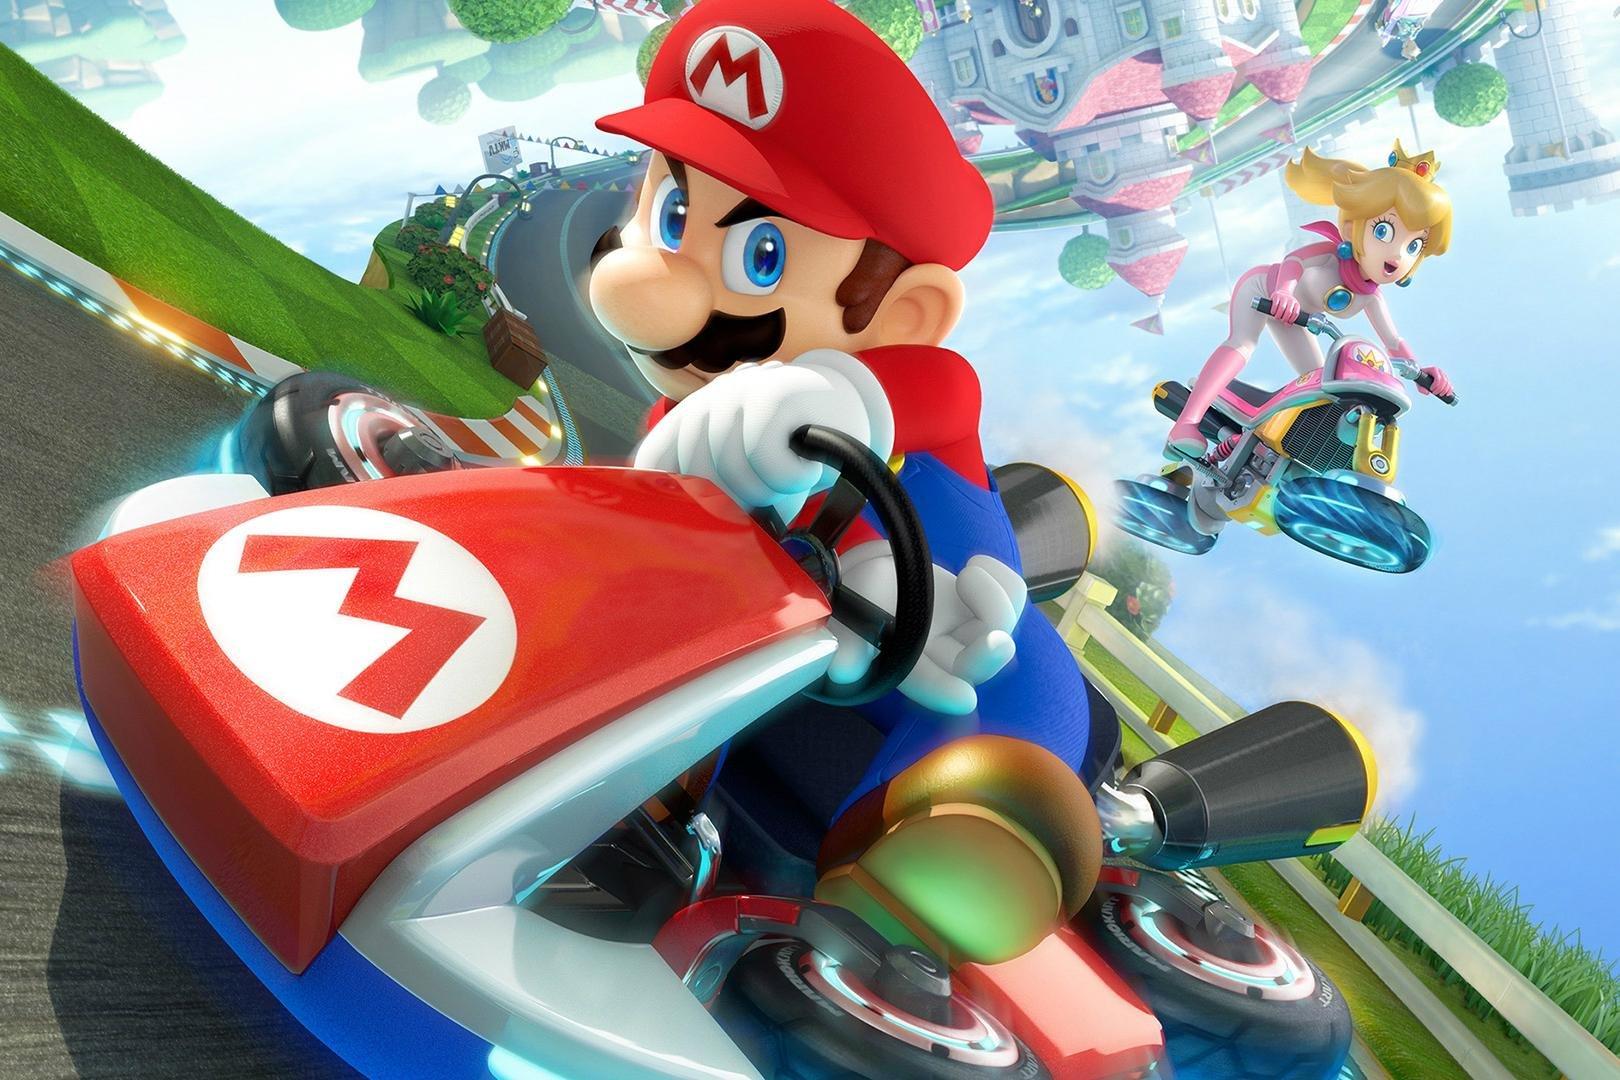 Mario neglects his duties | Gammicks